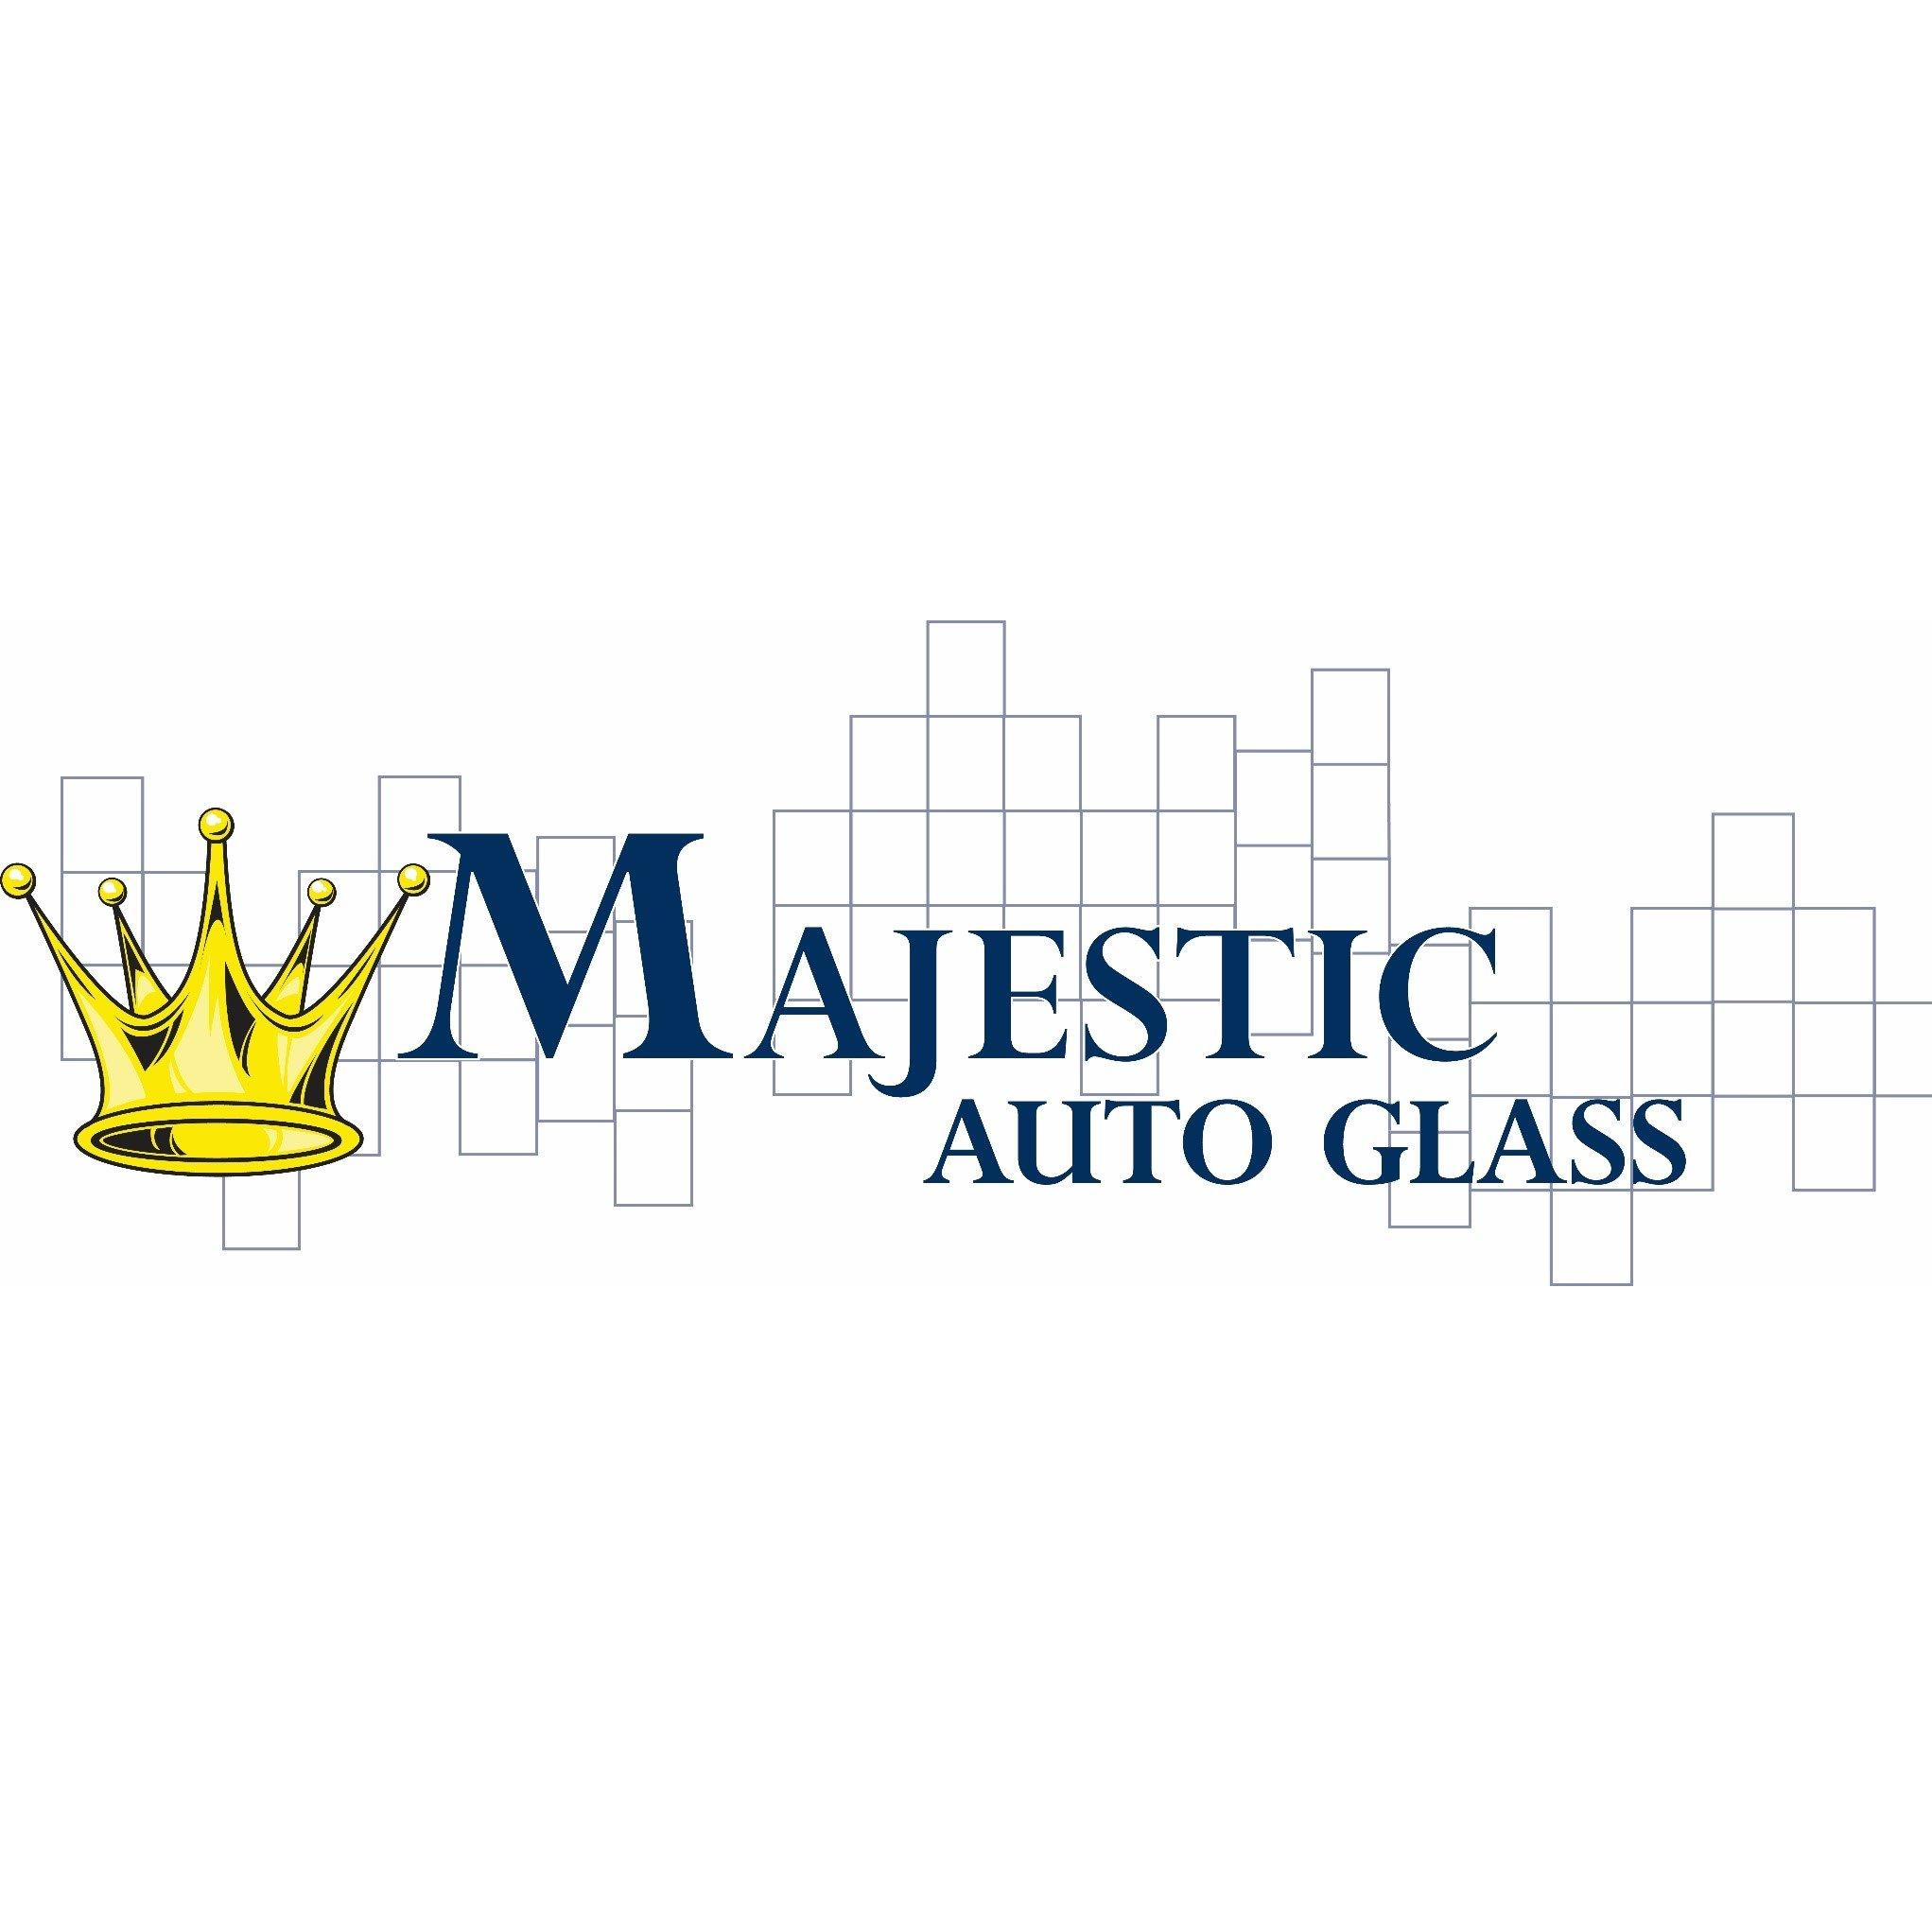 Majestic Auto Glass